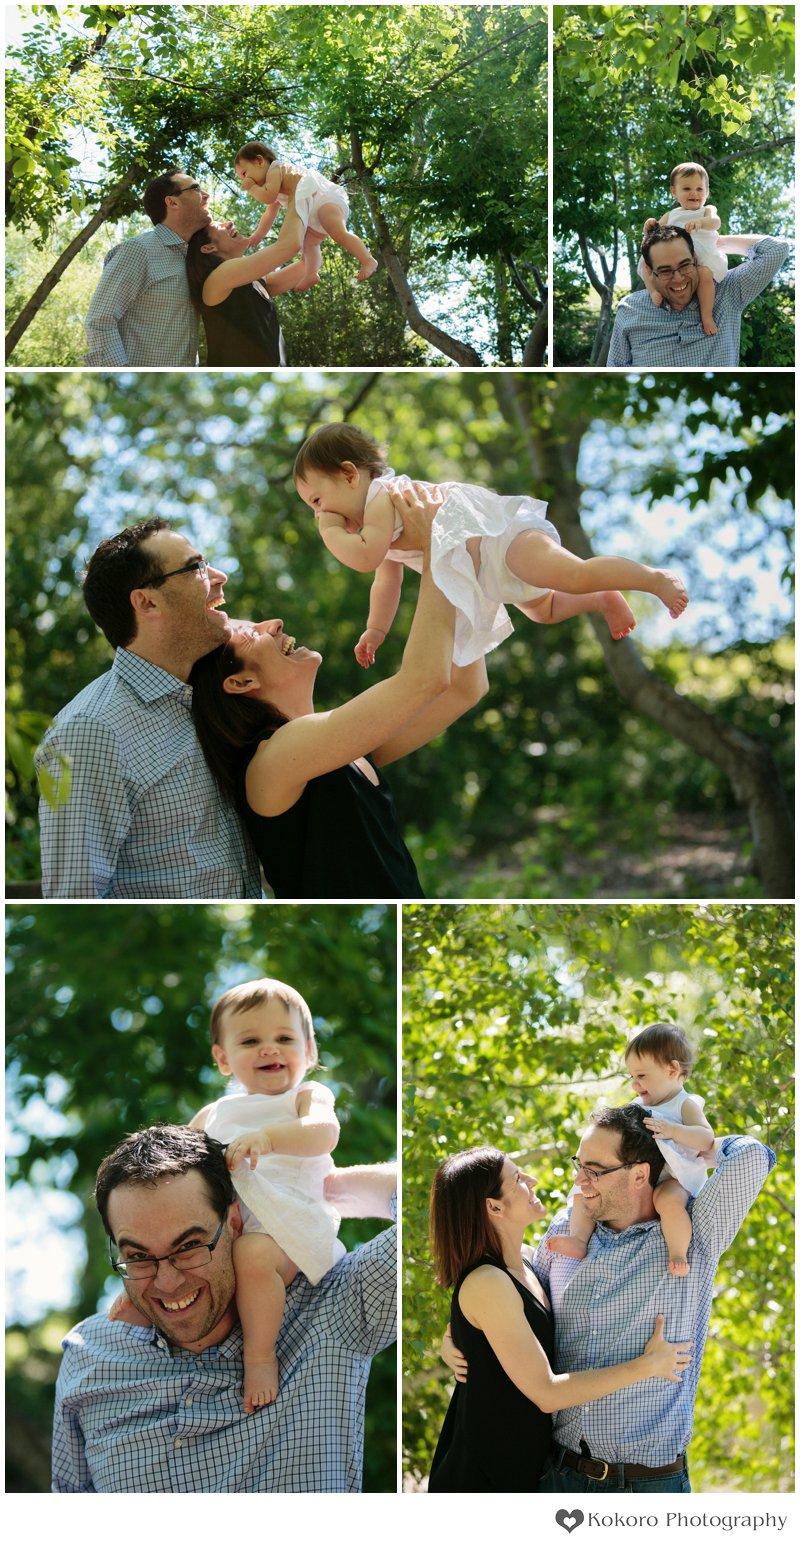 Colorado Baby Photographers | www.kokorophotography.com | Debi and Amanda Tipton